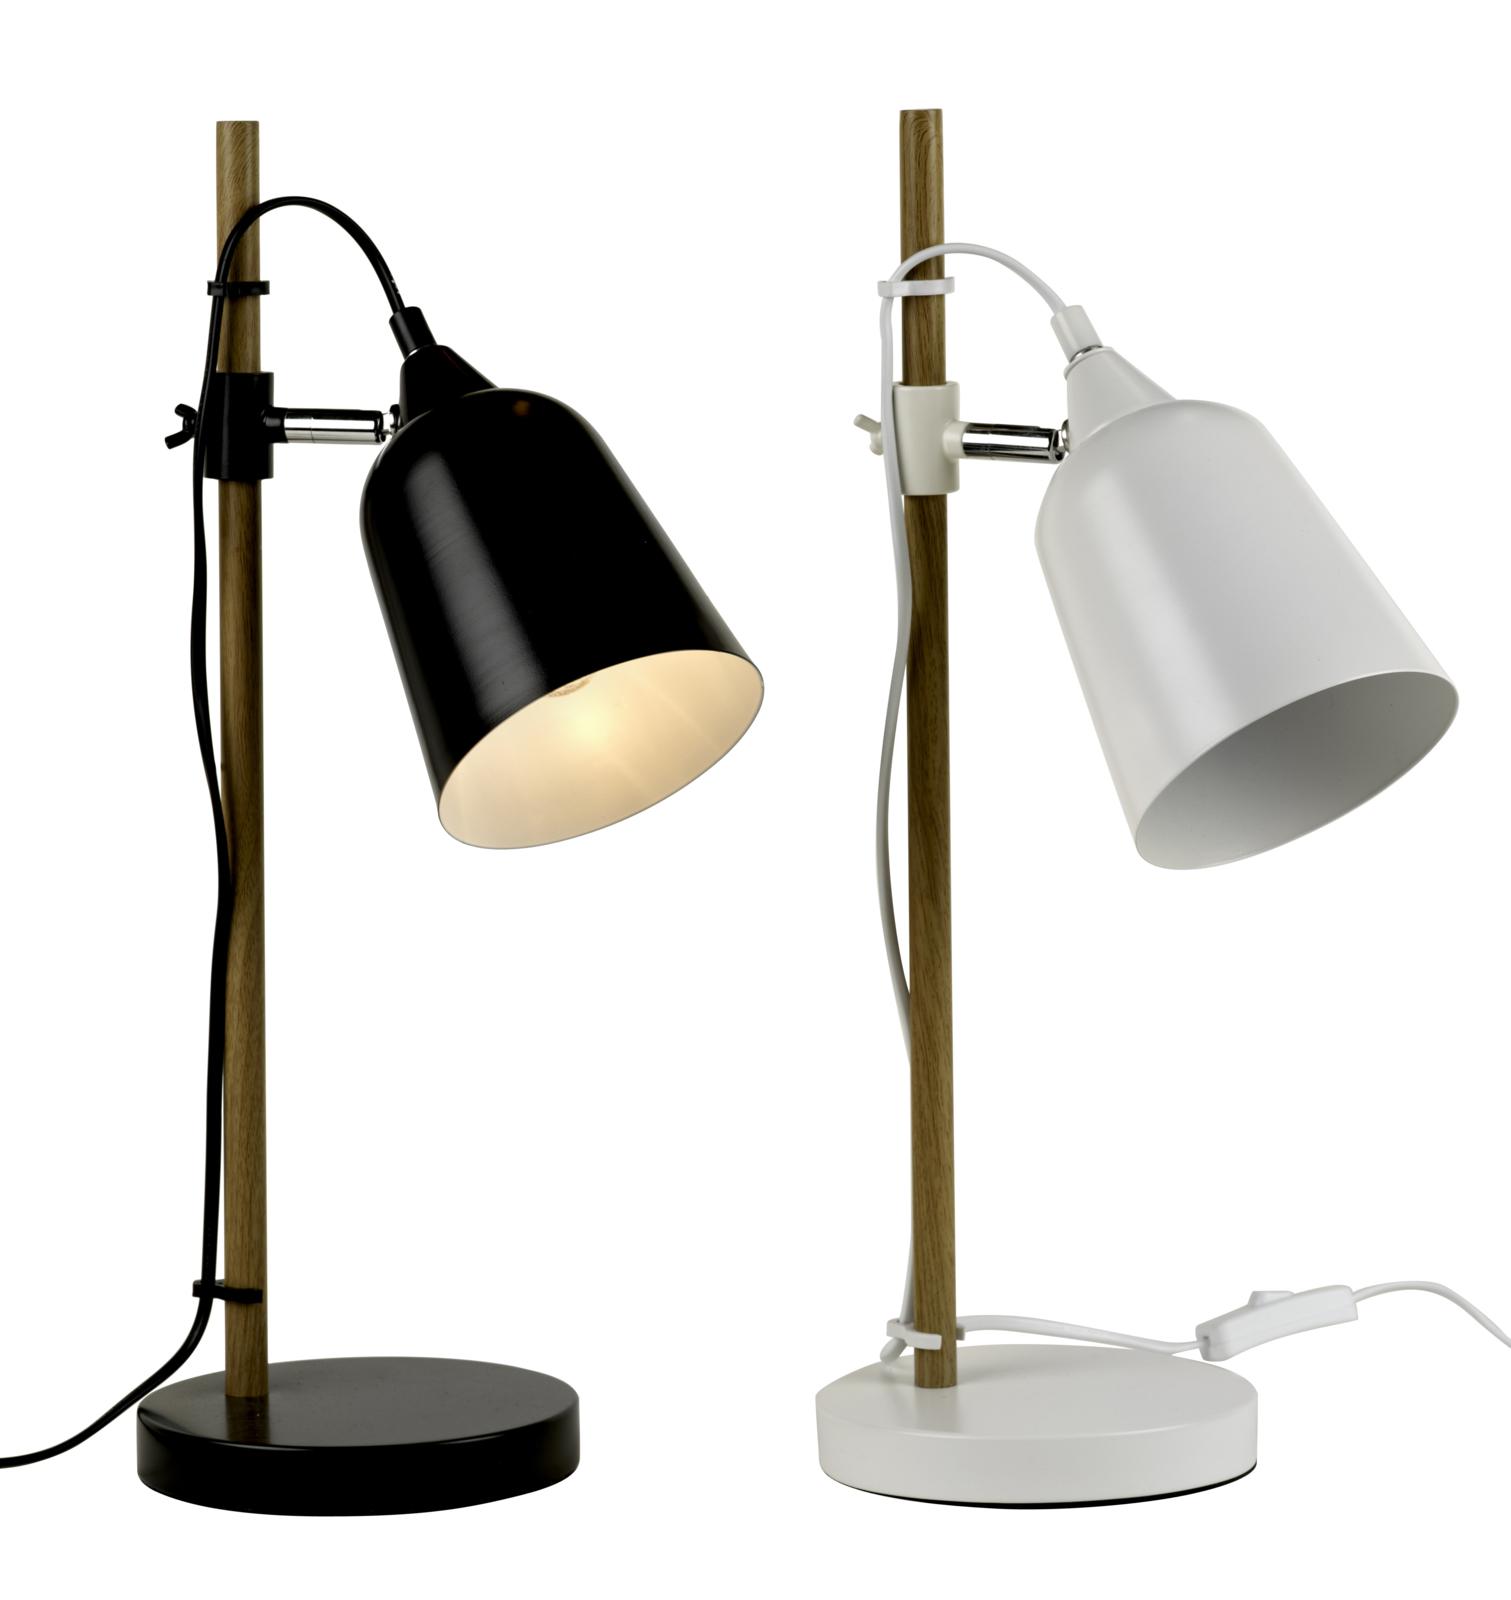 7-casa-drp-lampe-industrielle-570269